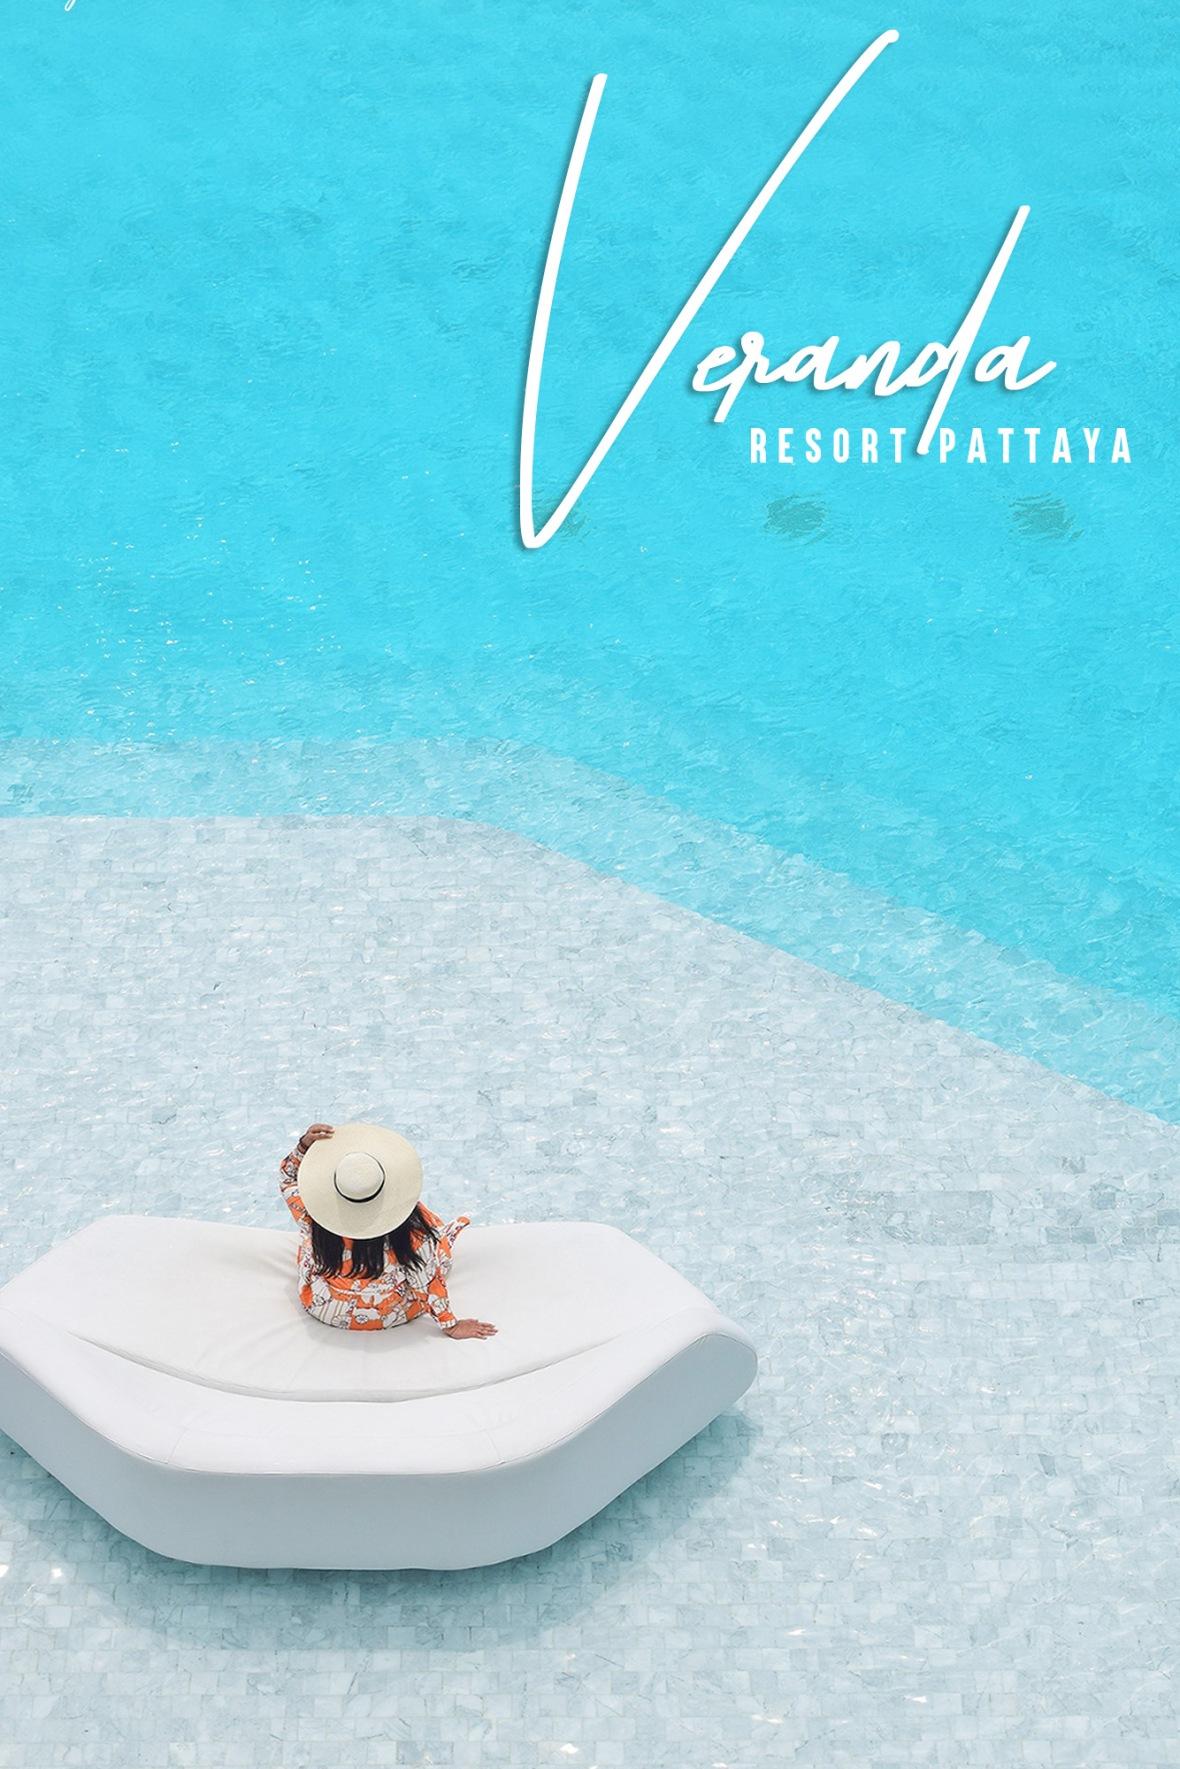 Veranda Resort Pattaya (1)